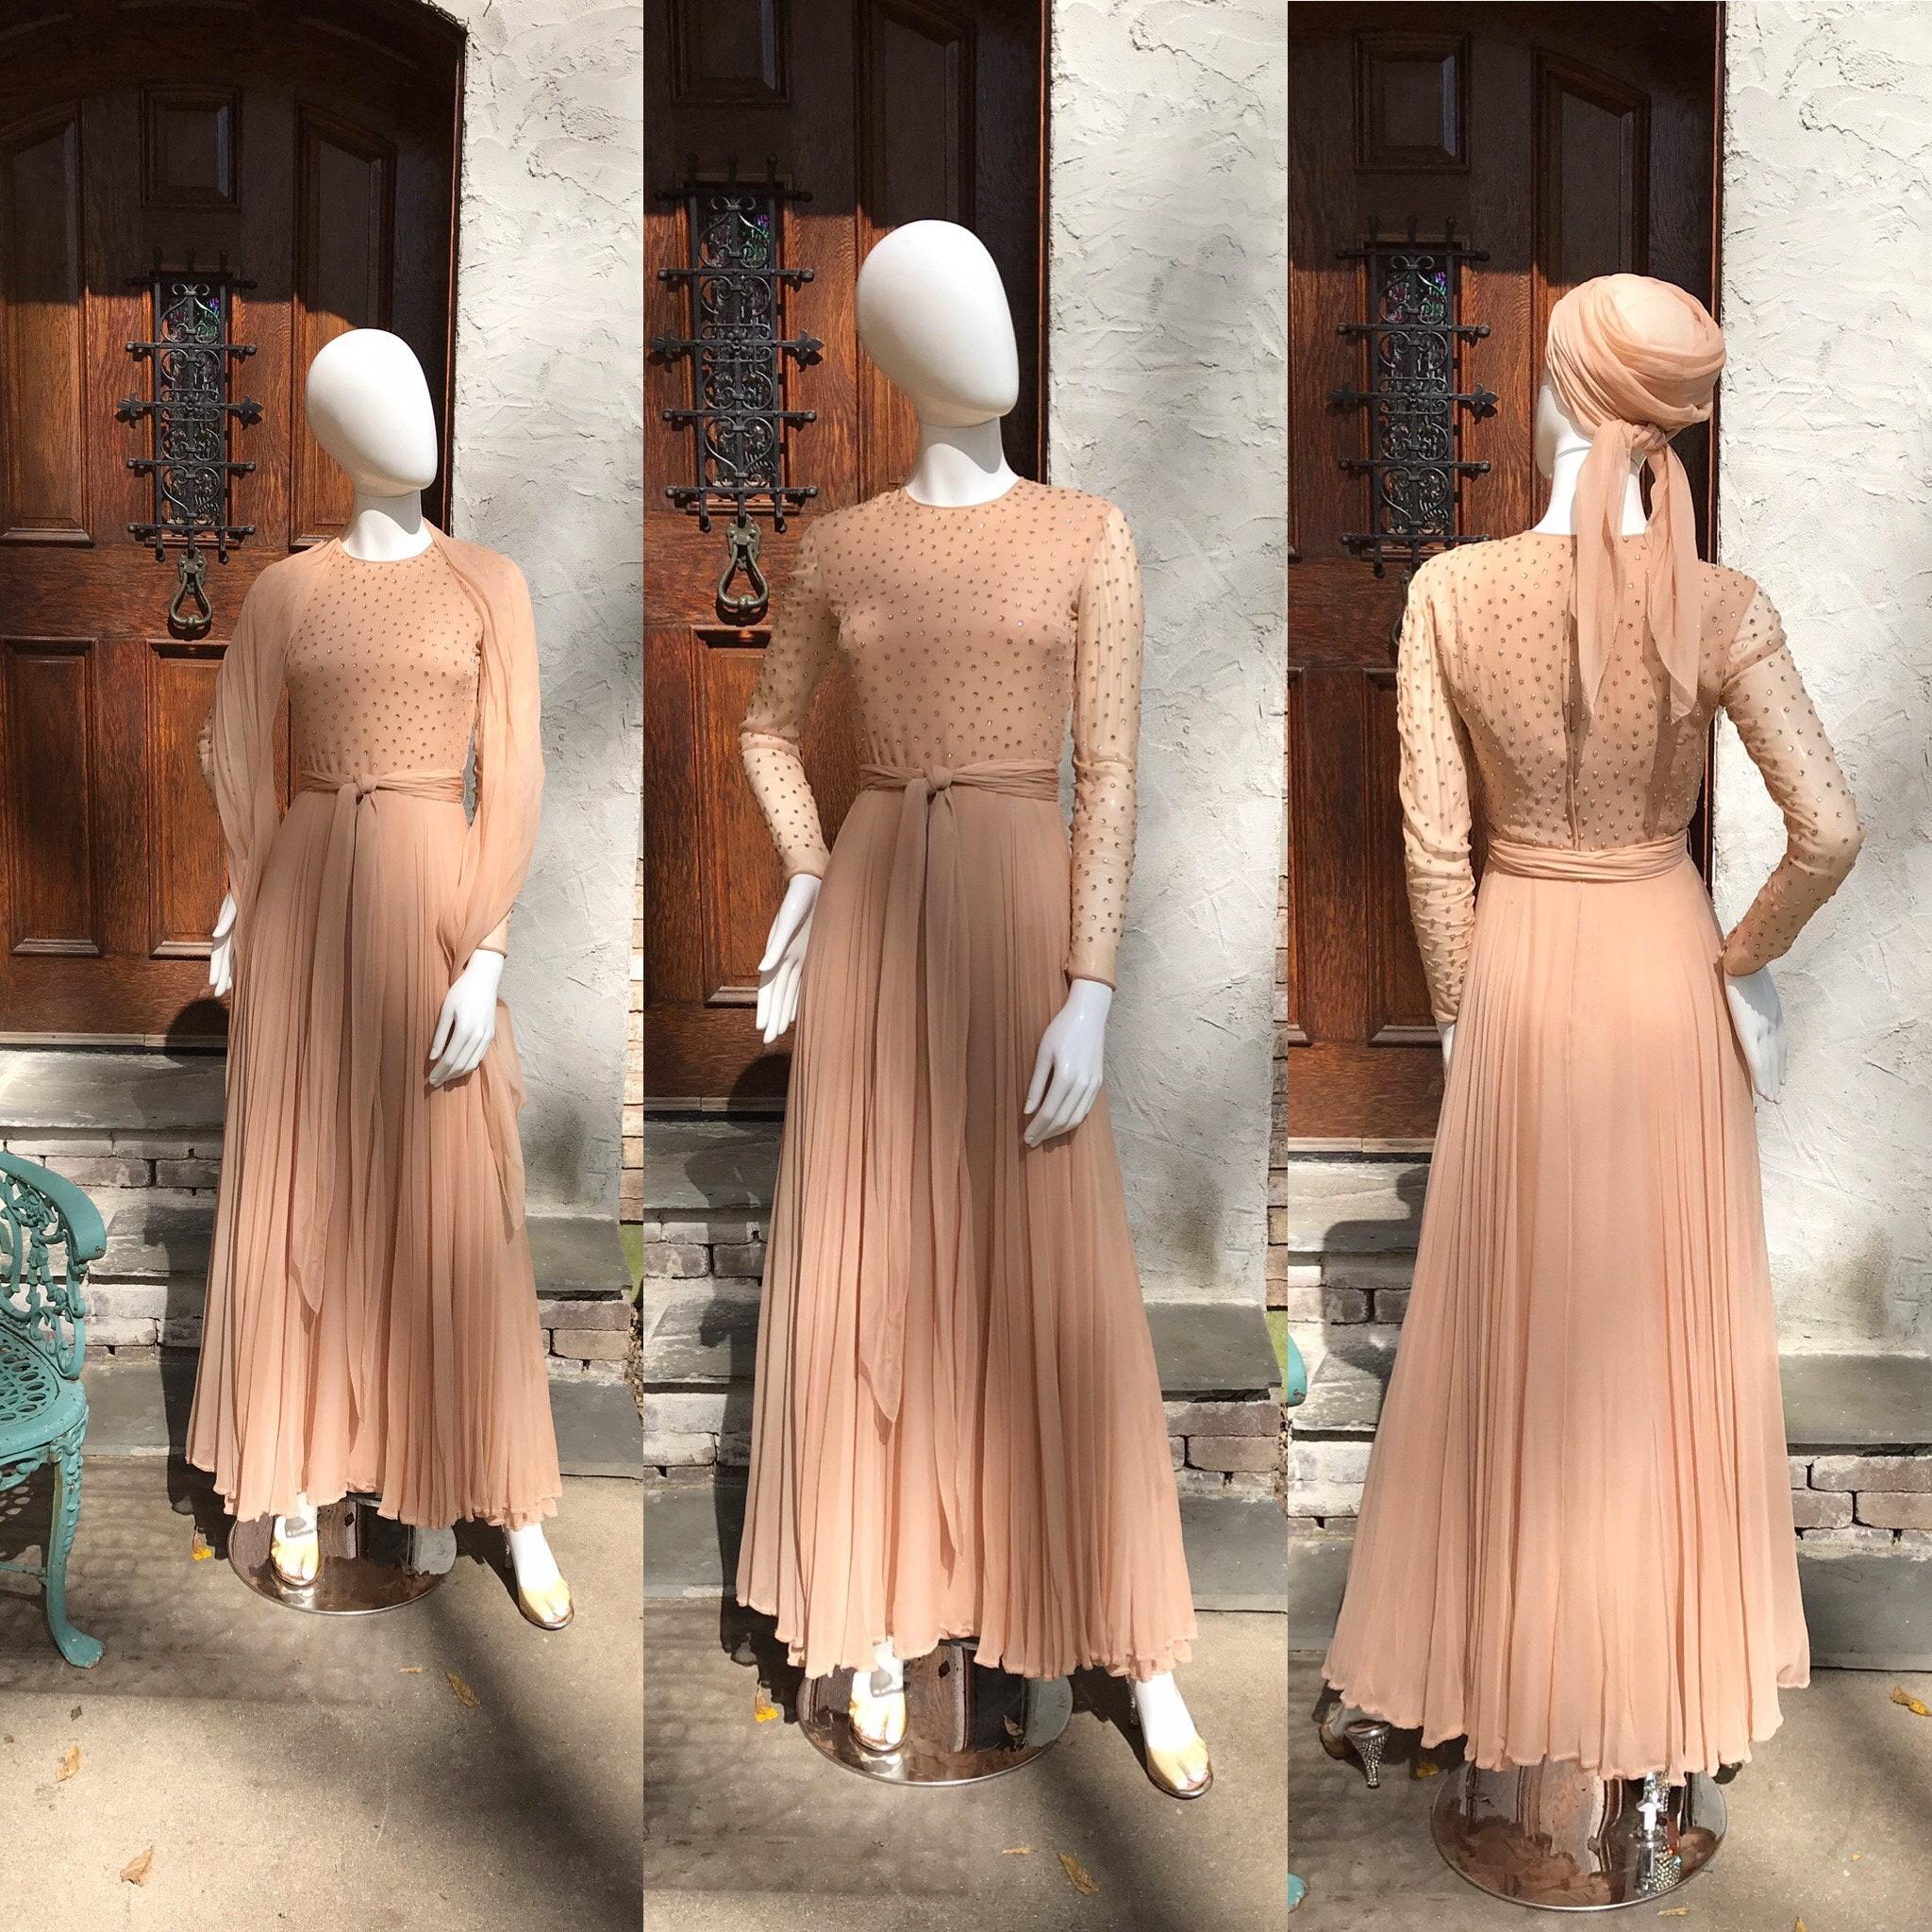 Vintage Scarf Styles -1920s to 1960s Vintage 1960s 70s Dazzling Rhinestone Blush Silk Chiffon Evening Gown Dress S $395.00 AT vintagedancer.com